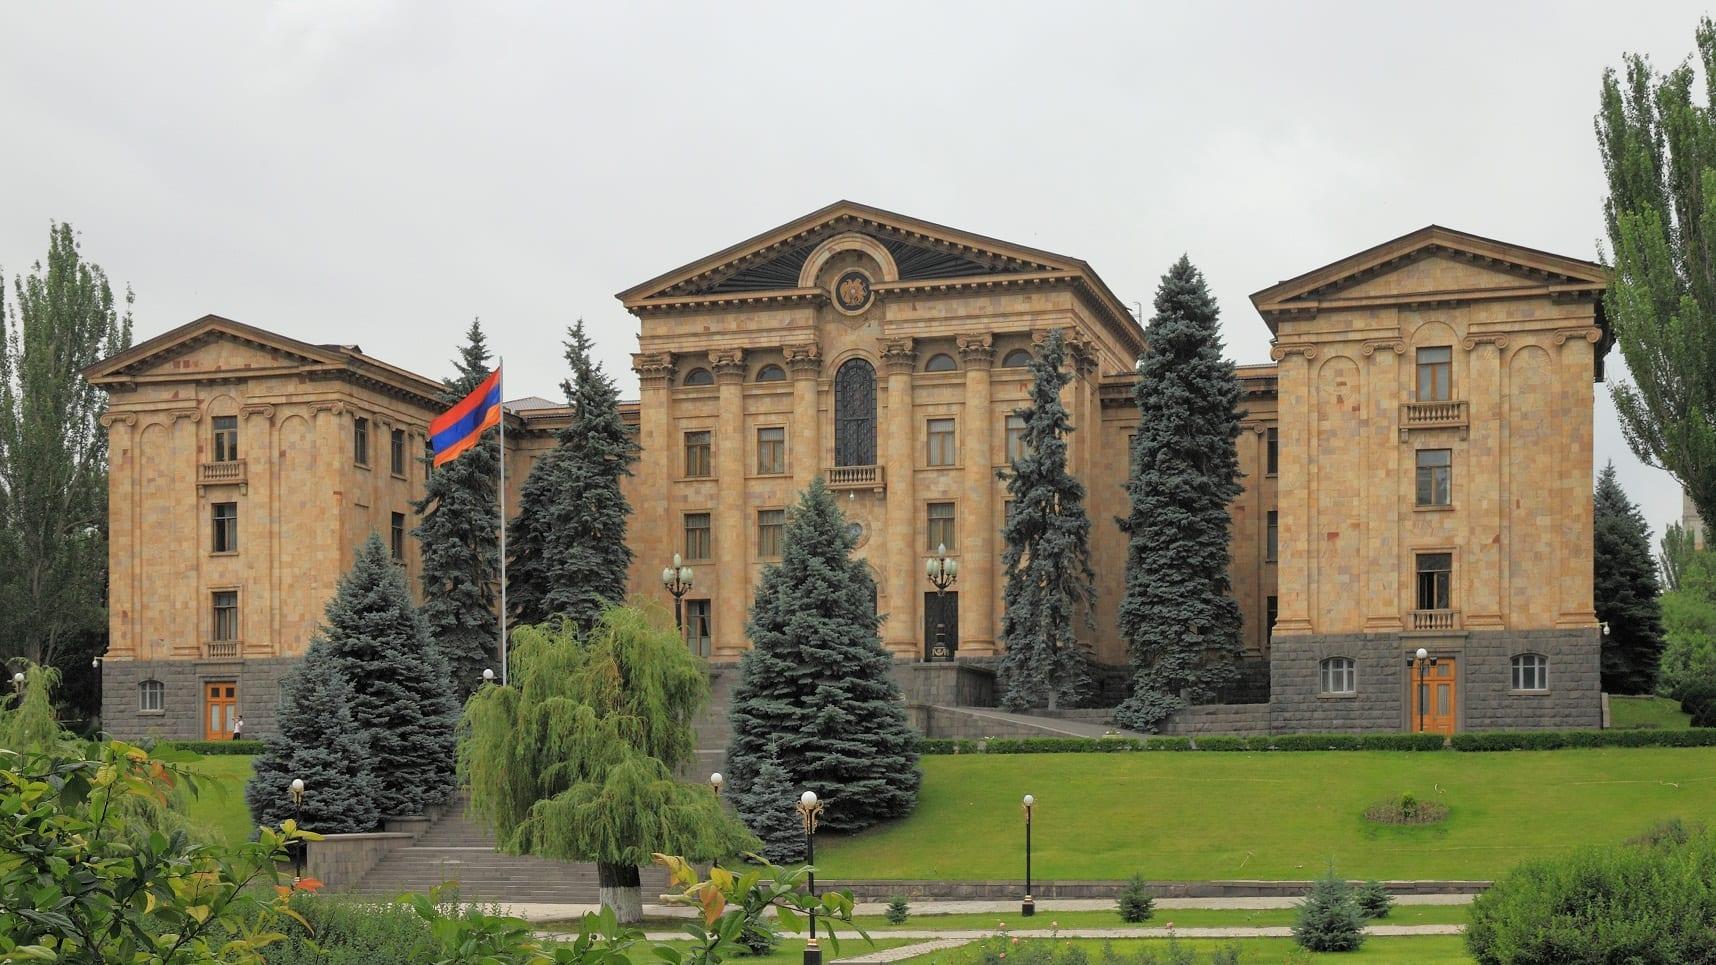 ermenistan parlamentosu kucuk